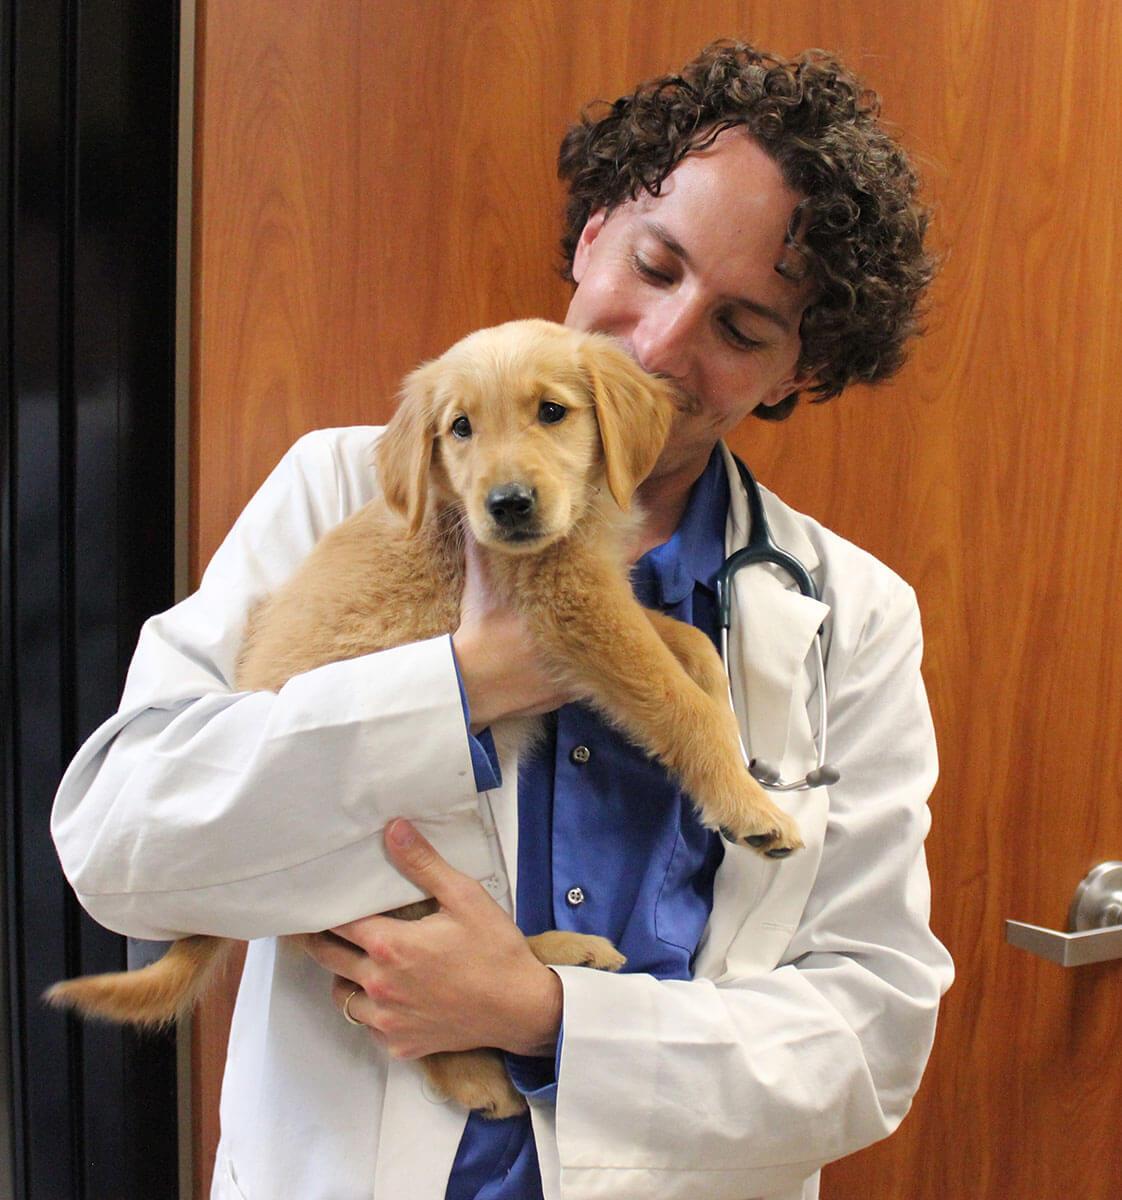 jason sweitzer dvm conejo valley veterinary hospital